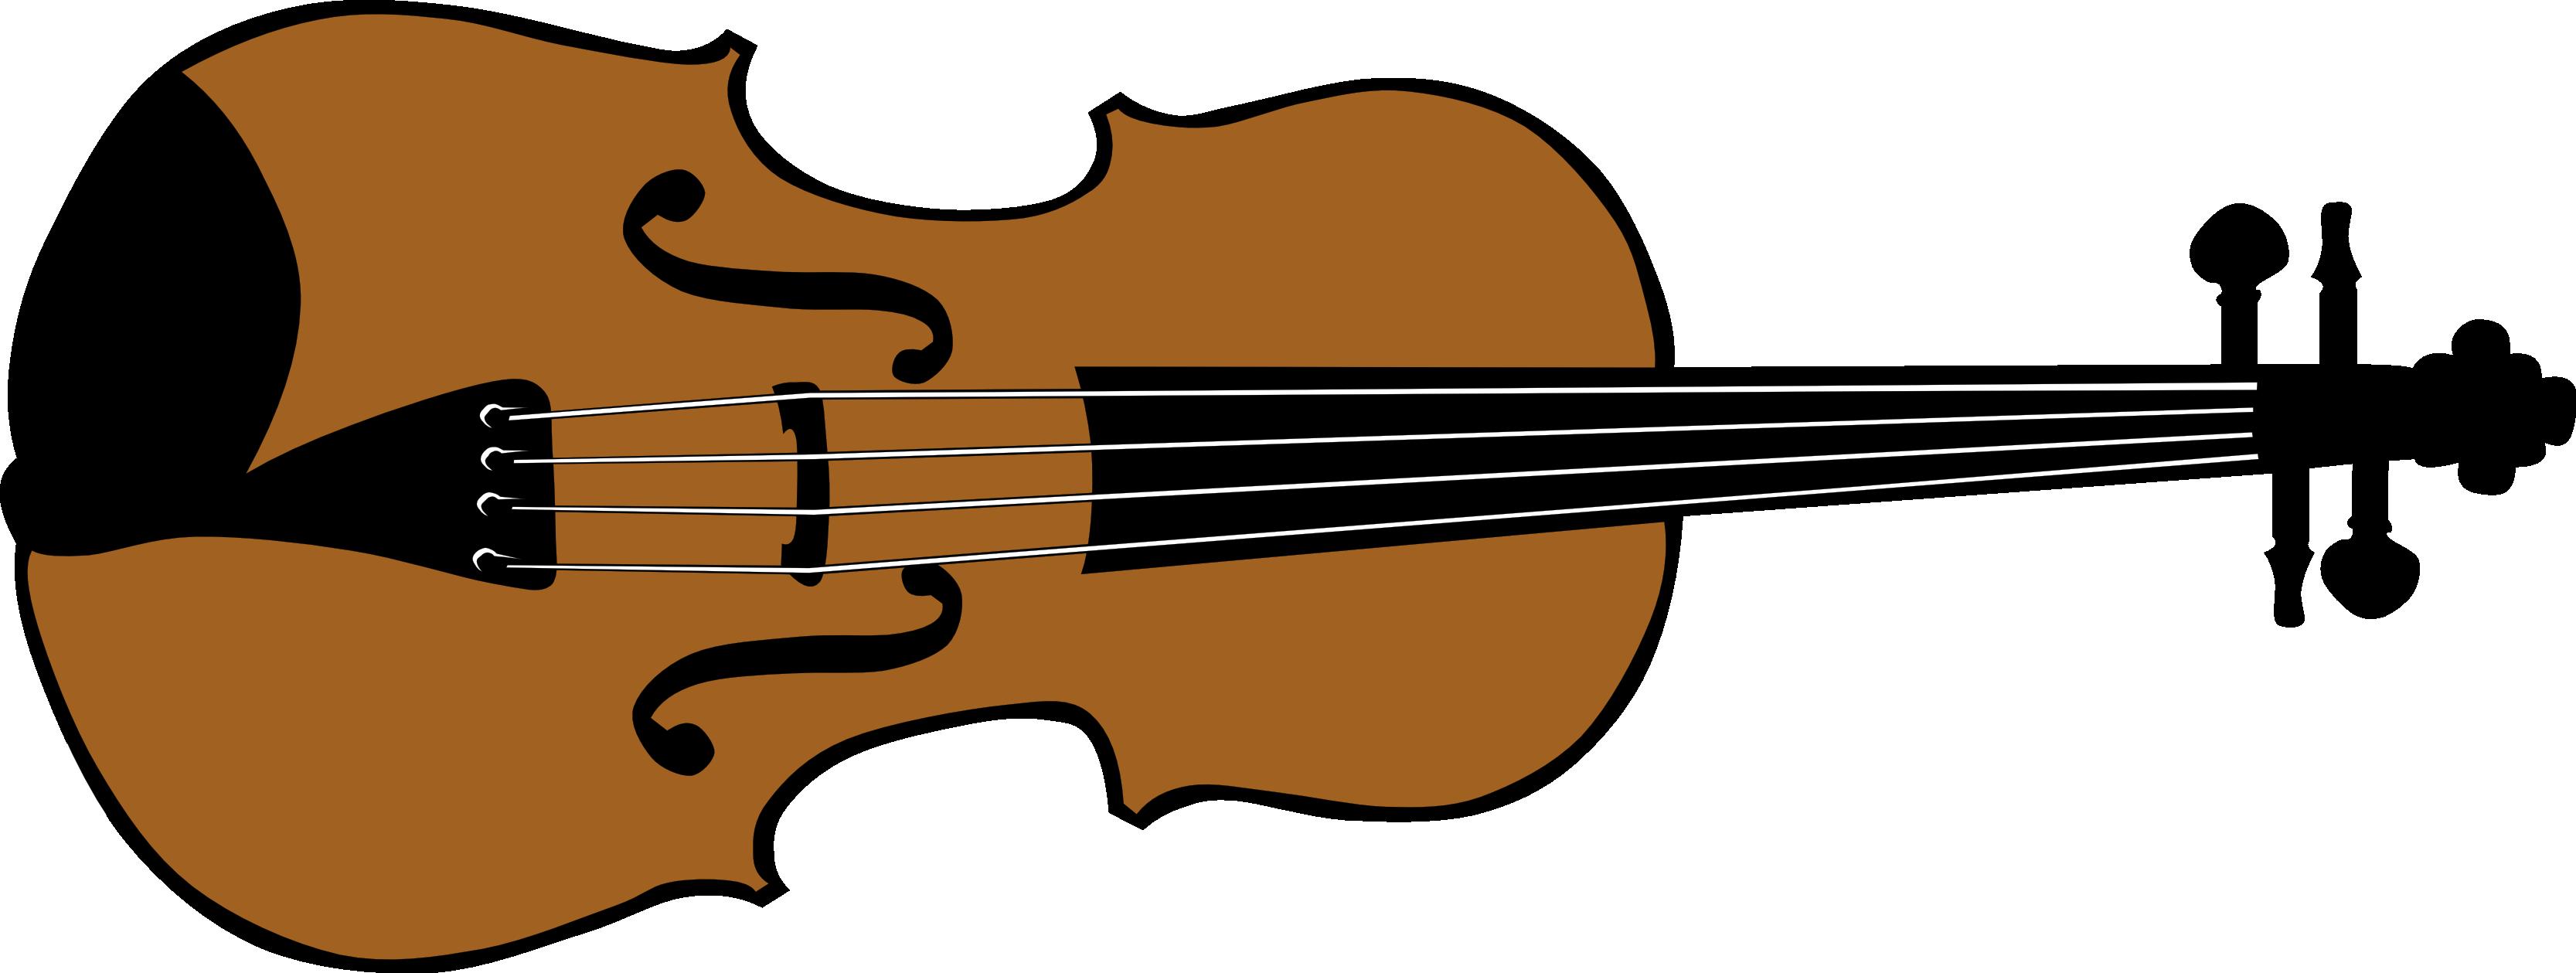 Violin clipart Clip violin clipart WikiClipArt Clipart